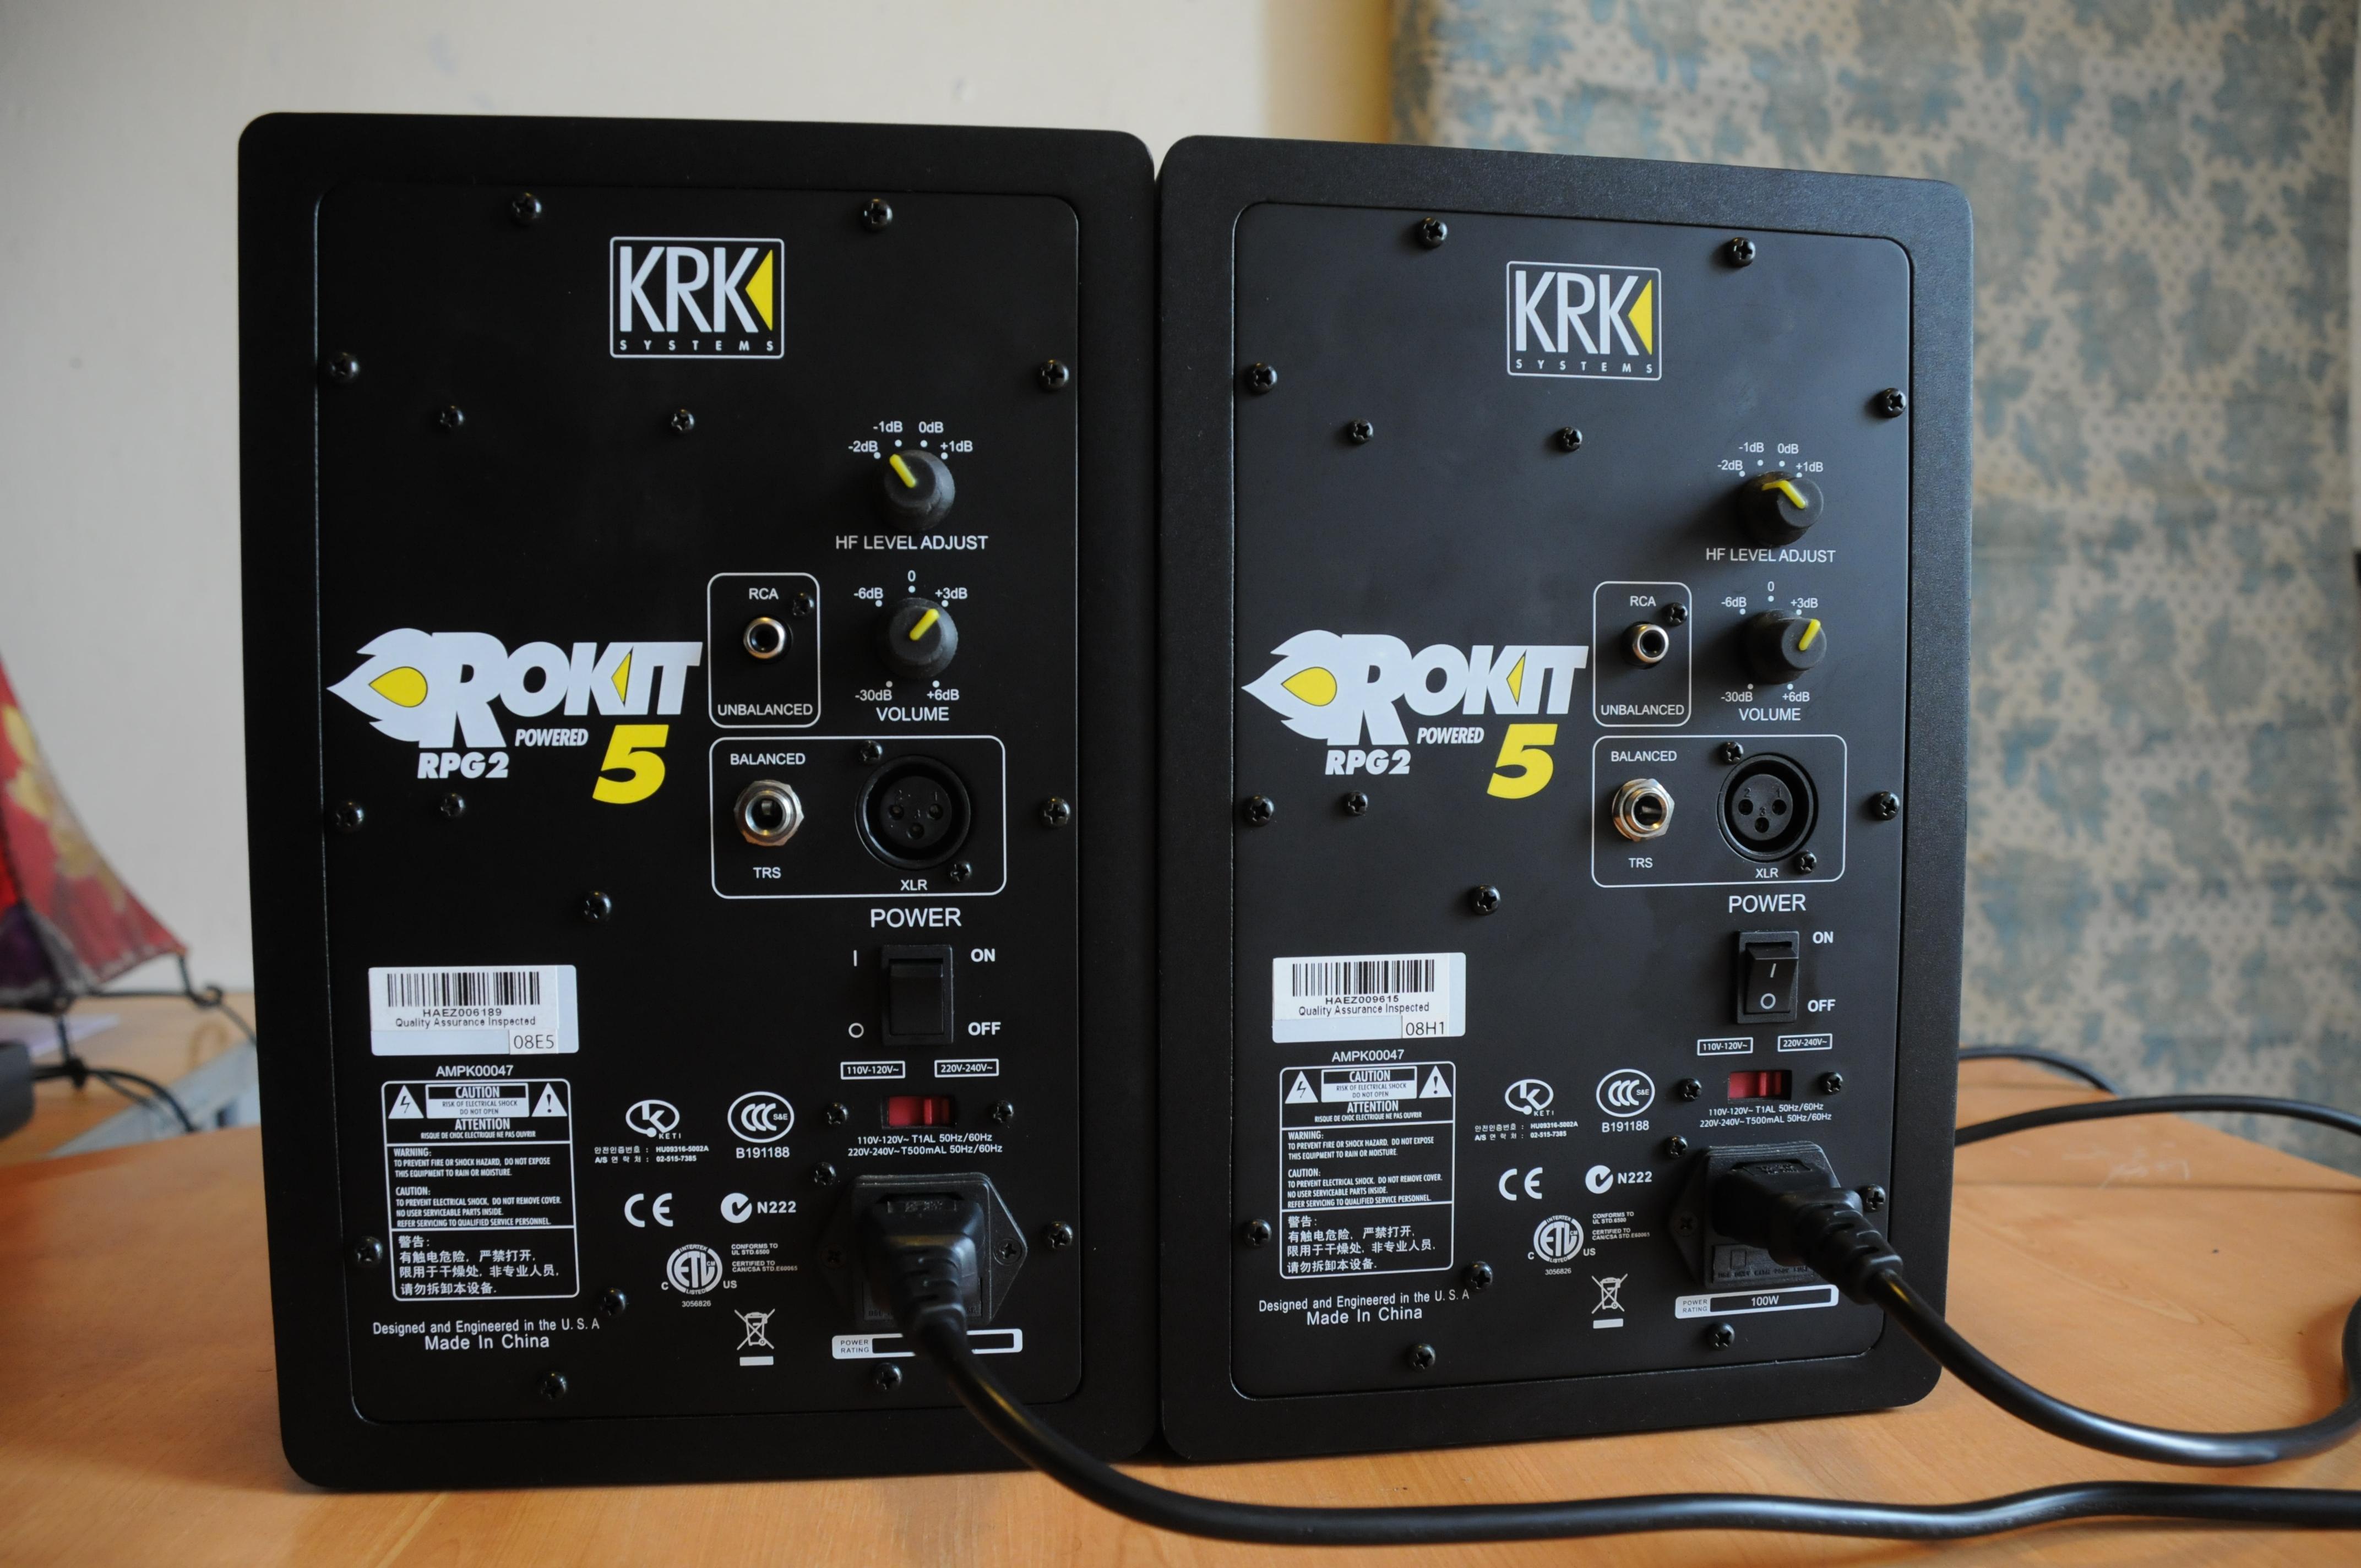 KRK Rokit 5 G2 image (#456283) - Audiofanzine